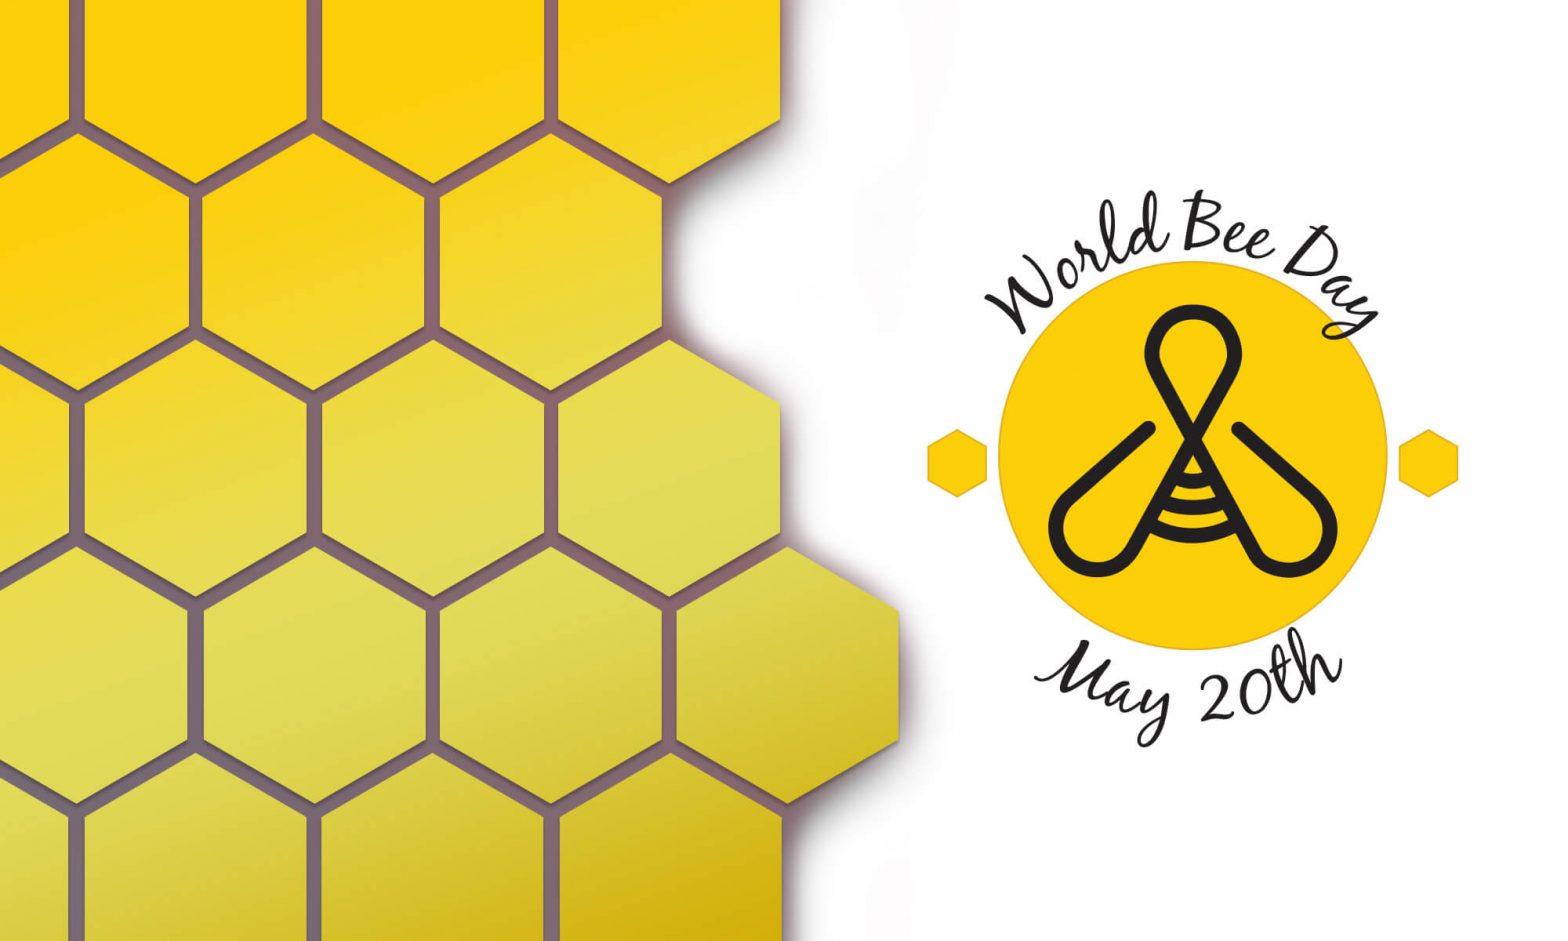 World Bee Day observed globally on 20th May | മെയ് 20 ന് ആഗോള തേനീച്ച ദിനം ആഗോളതലത്തിൽ ആചരിച്ചു_40.1